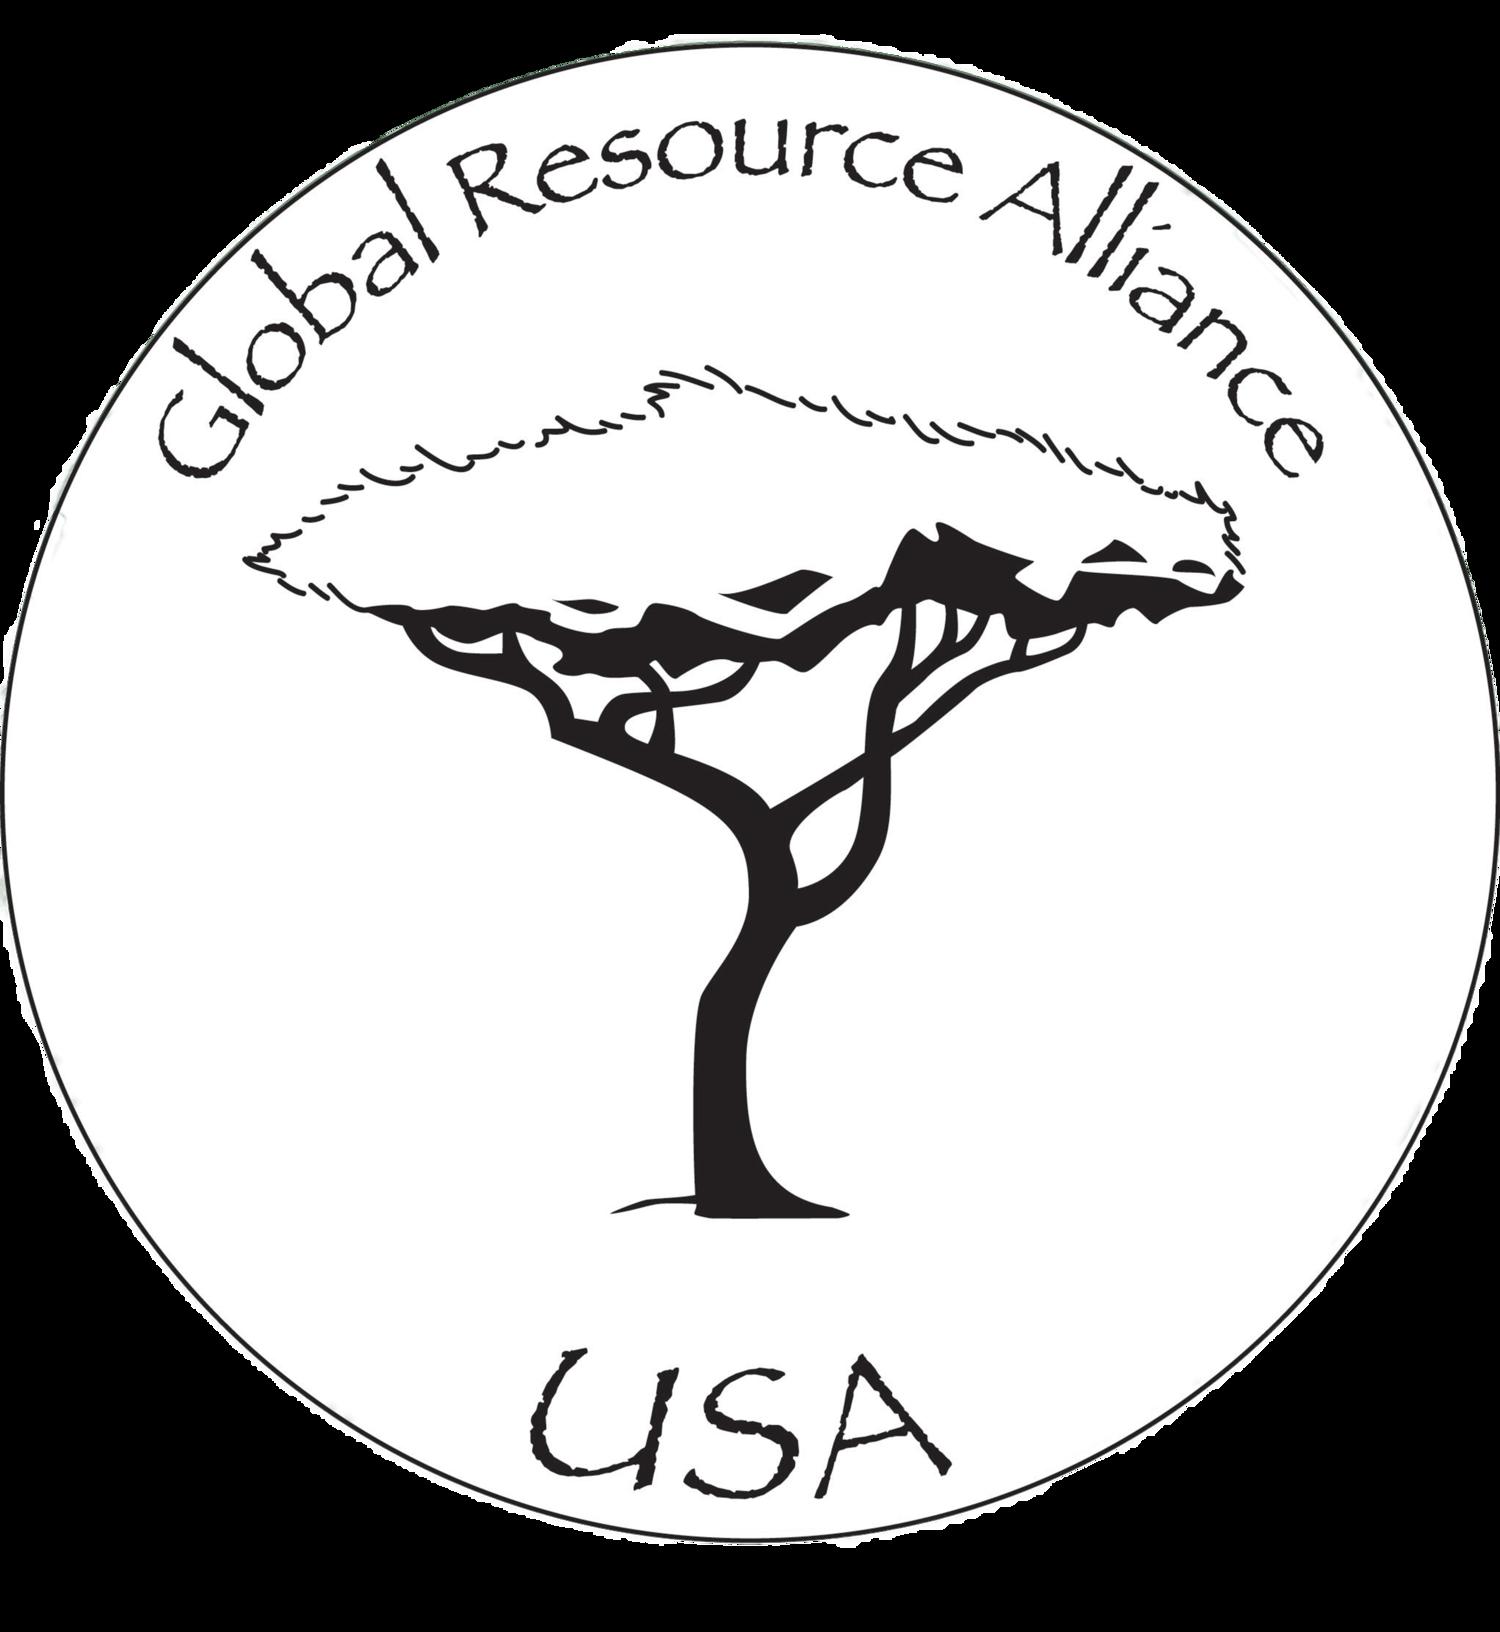 Global Resource Alliance Inc logo